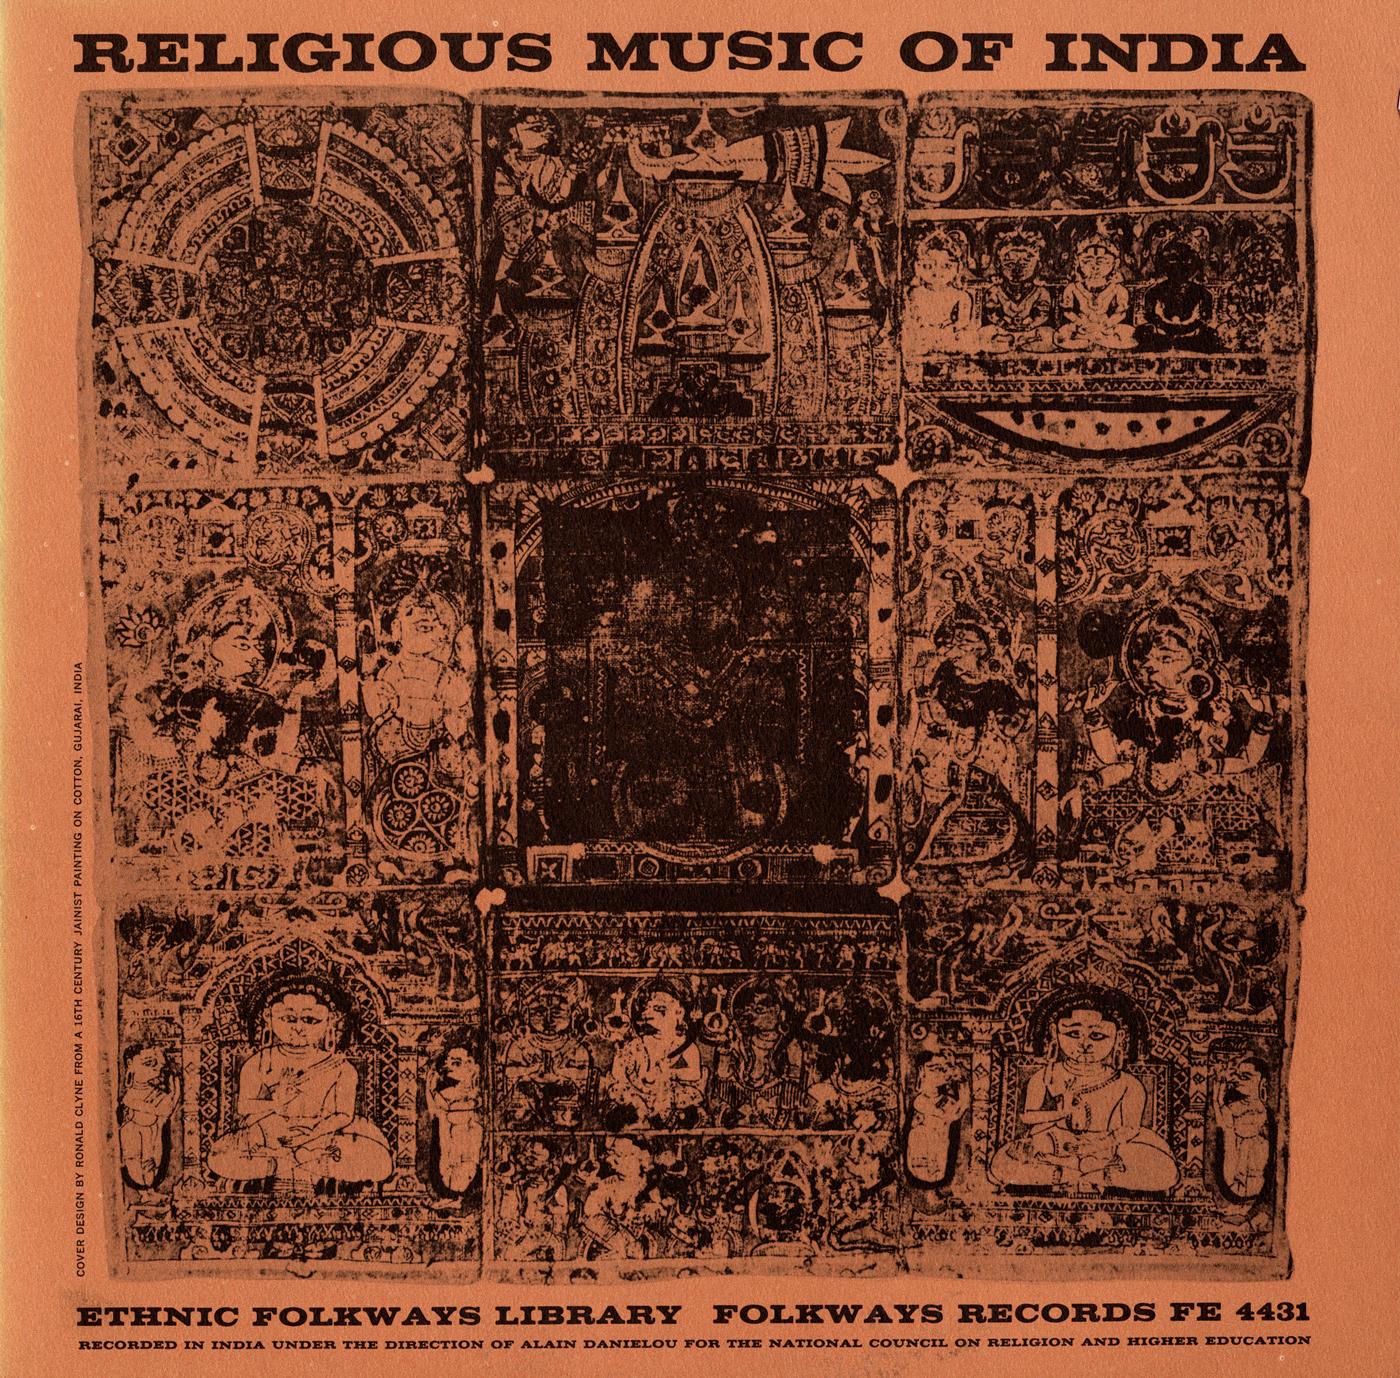 Religious Music of India | Smithsonian Folkways Recordings